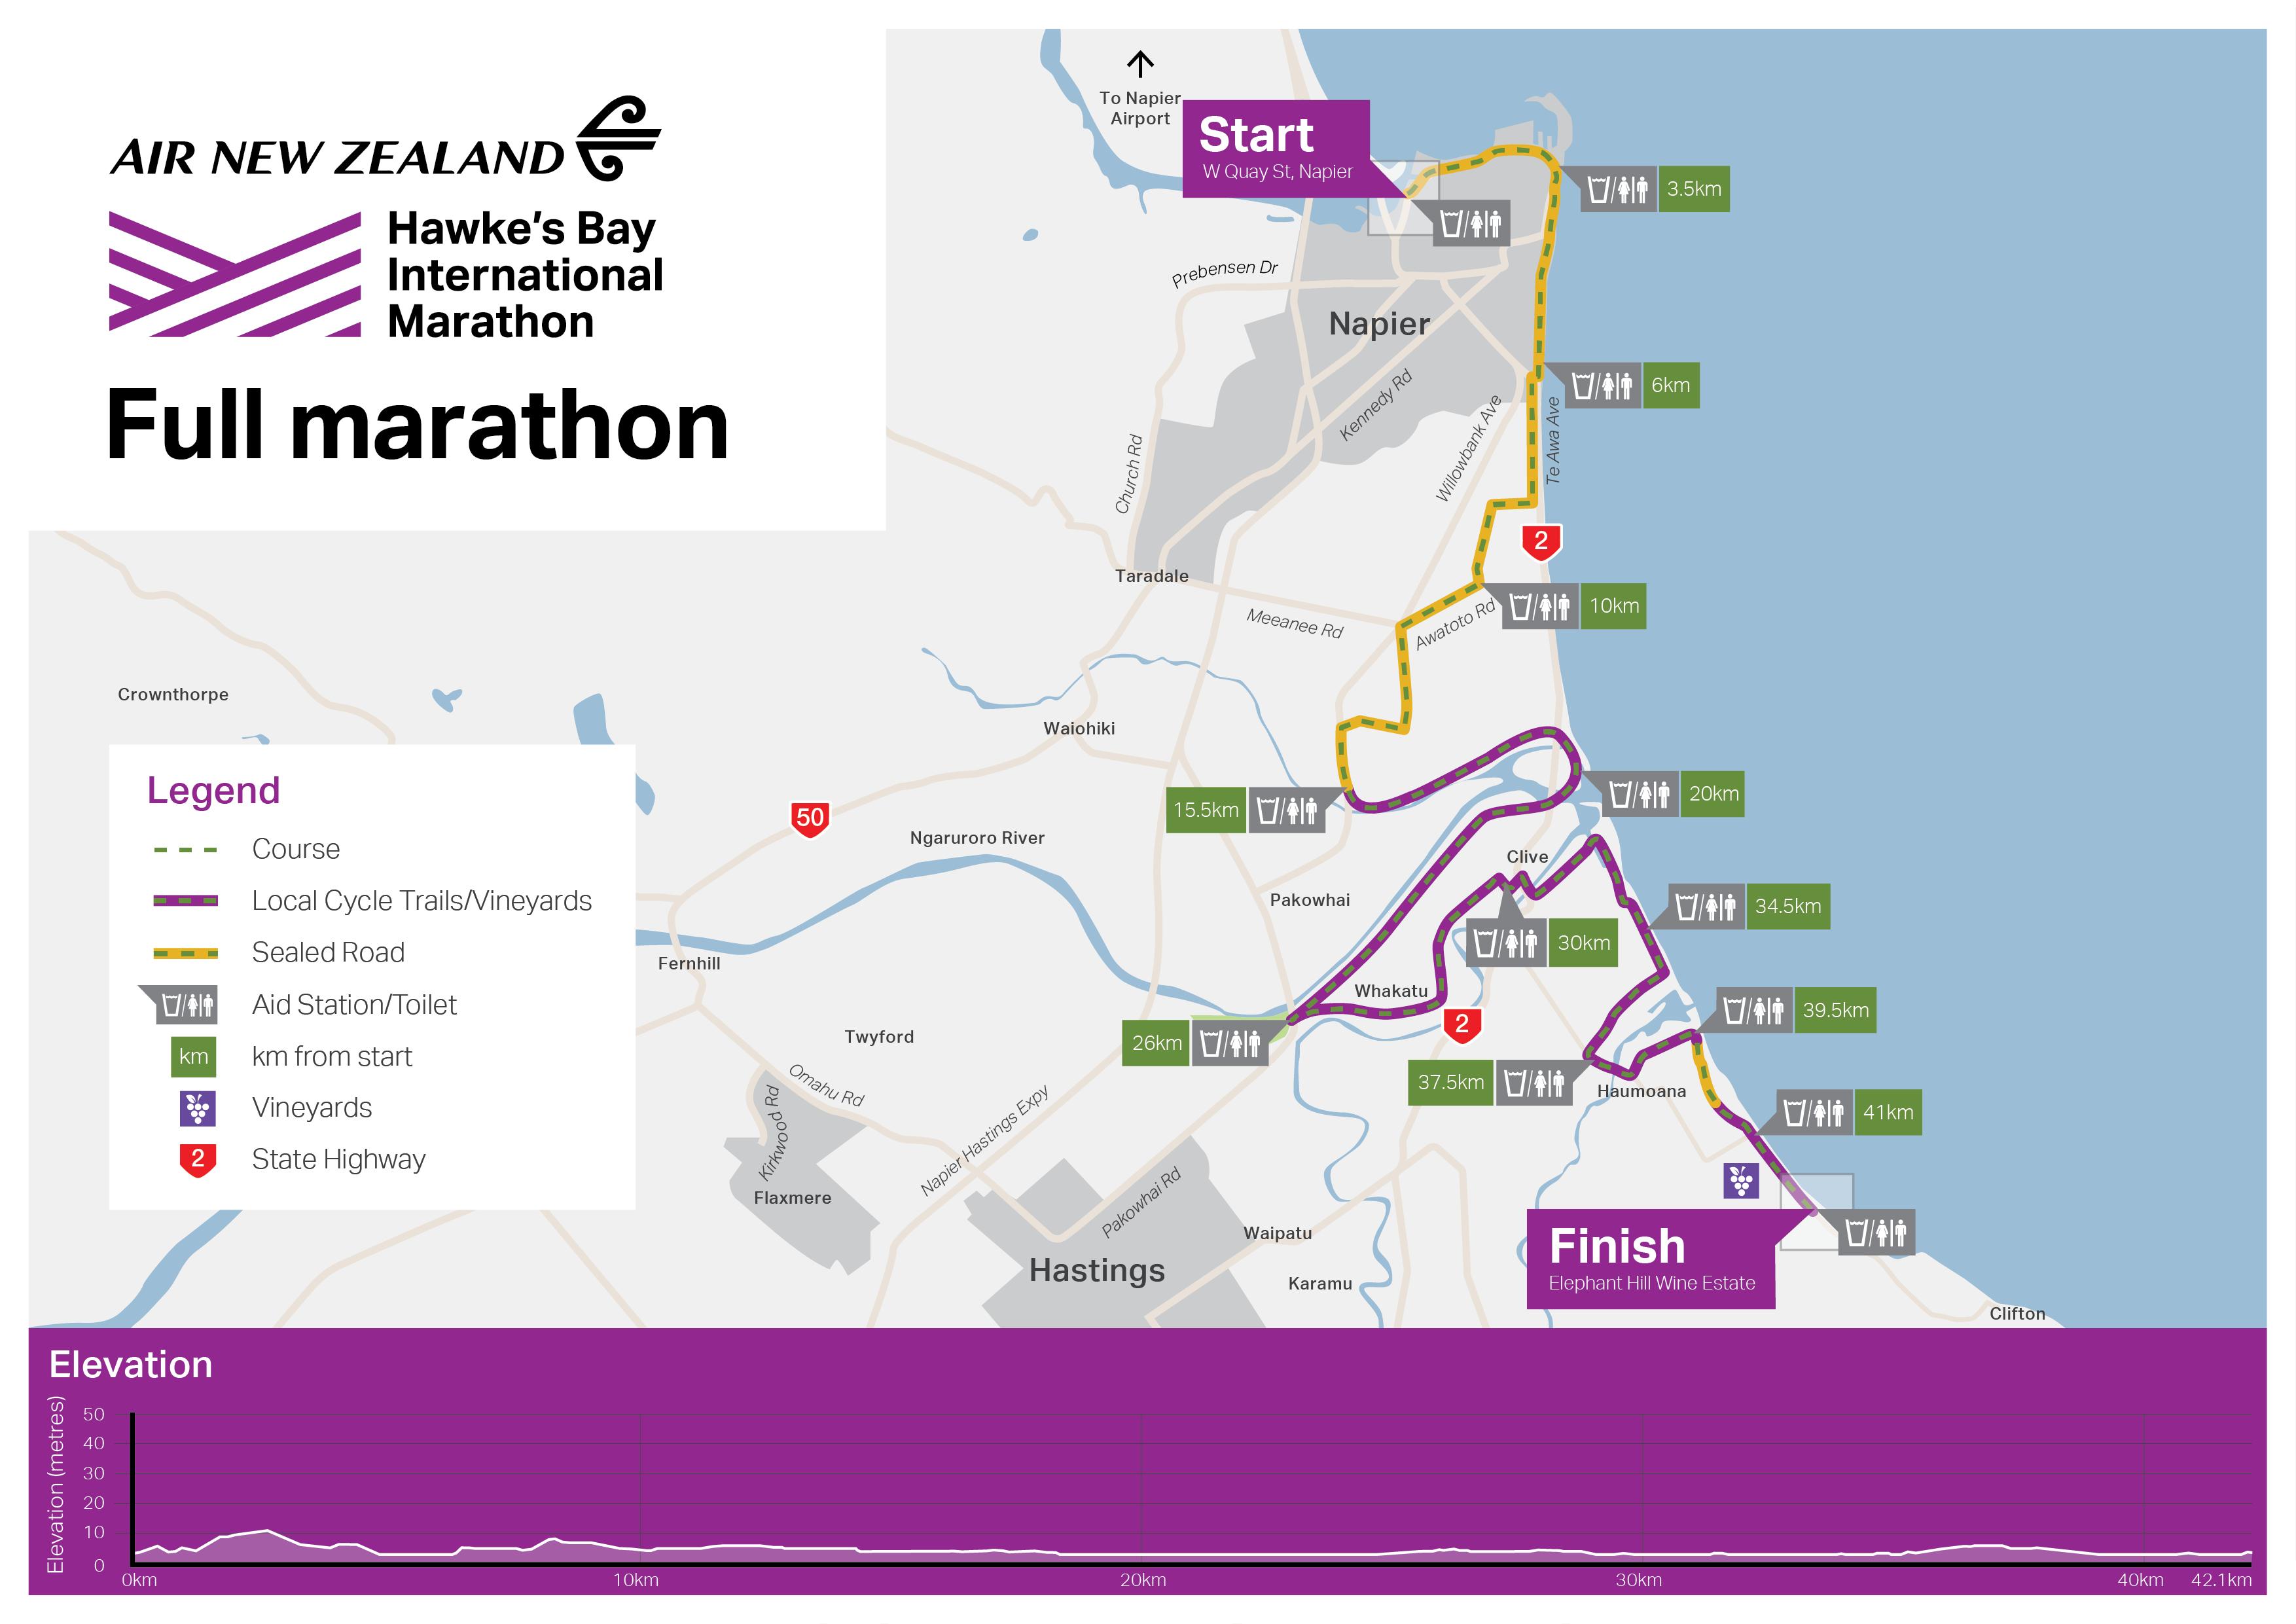 New Zealand Map Pdf.Air New Zealand Marathon Hawke S Bay International Marathon